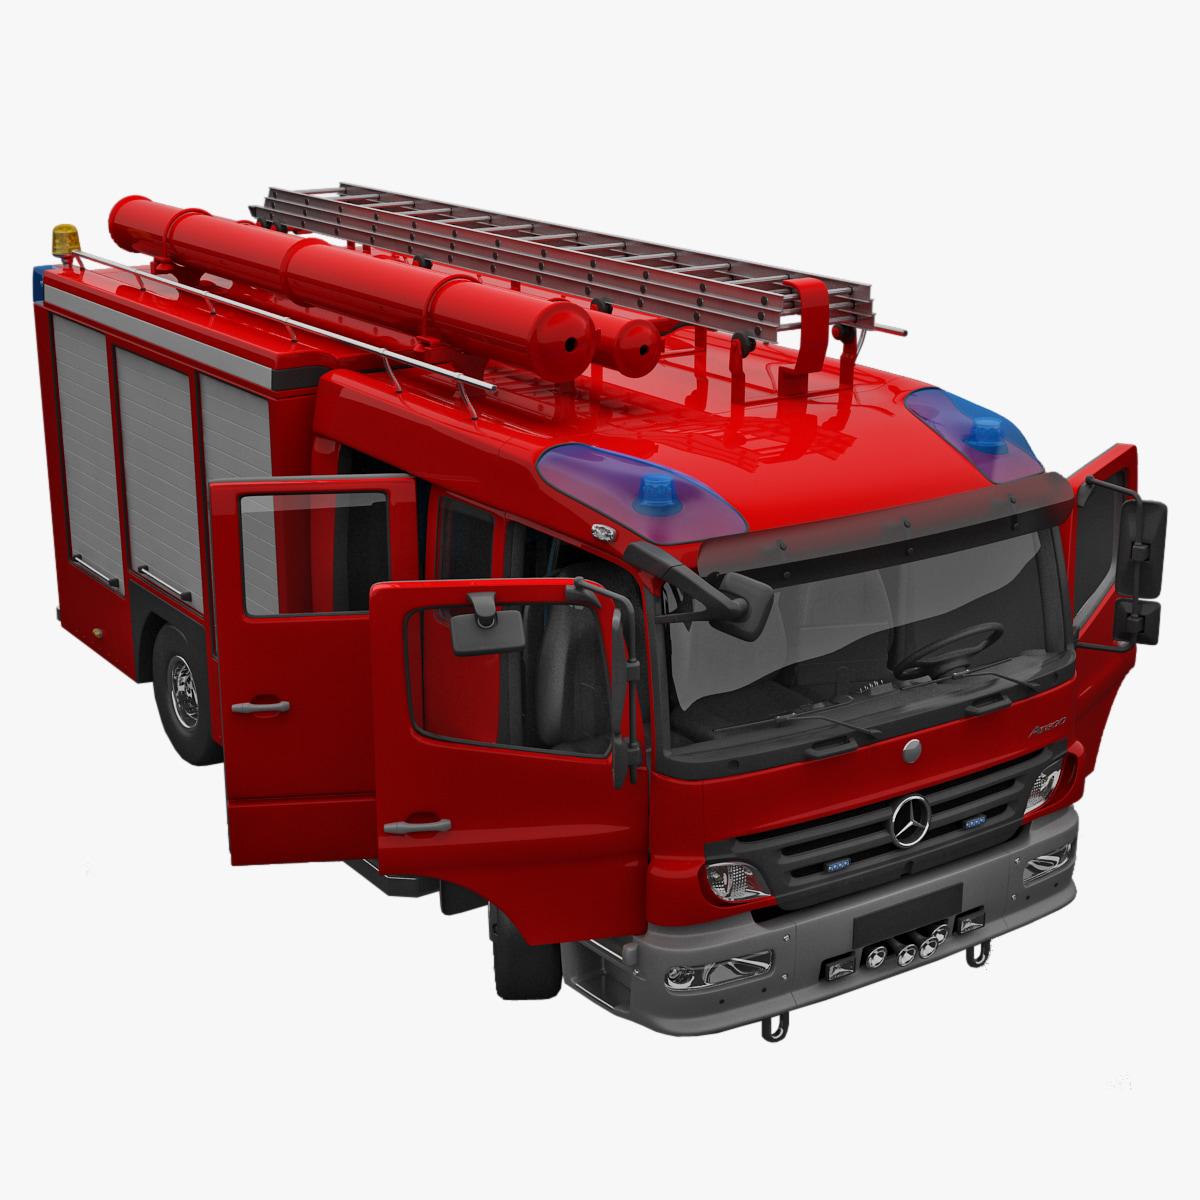 Mercedes_Atego_Fire_Truck_max_0002.jpg